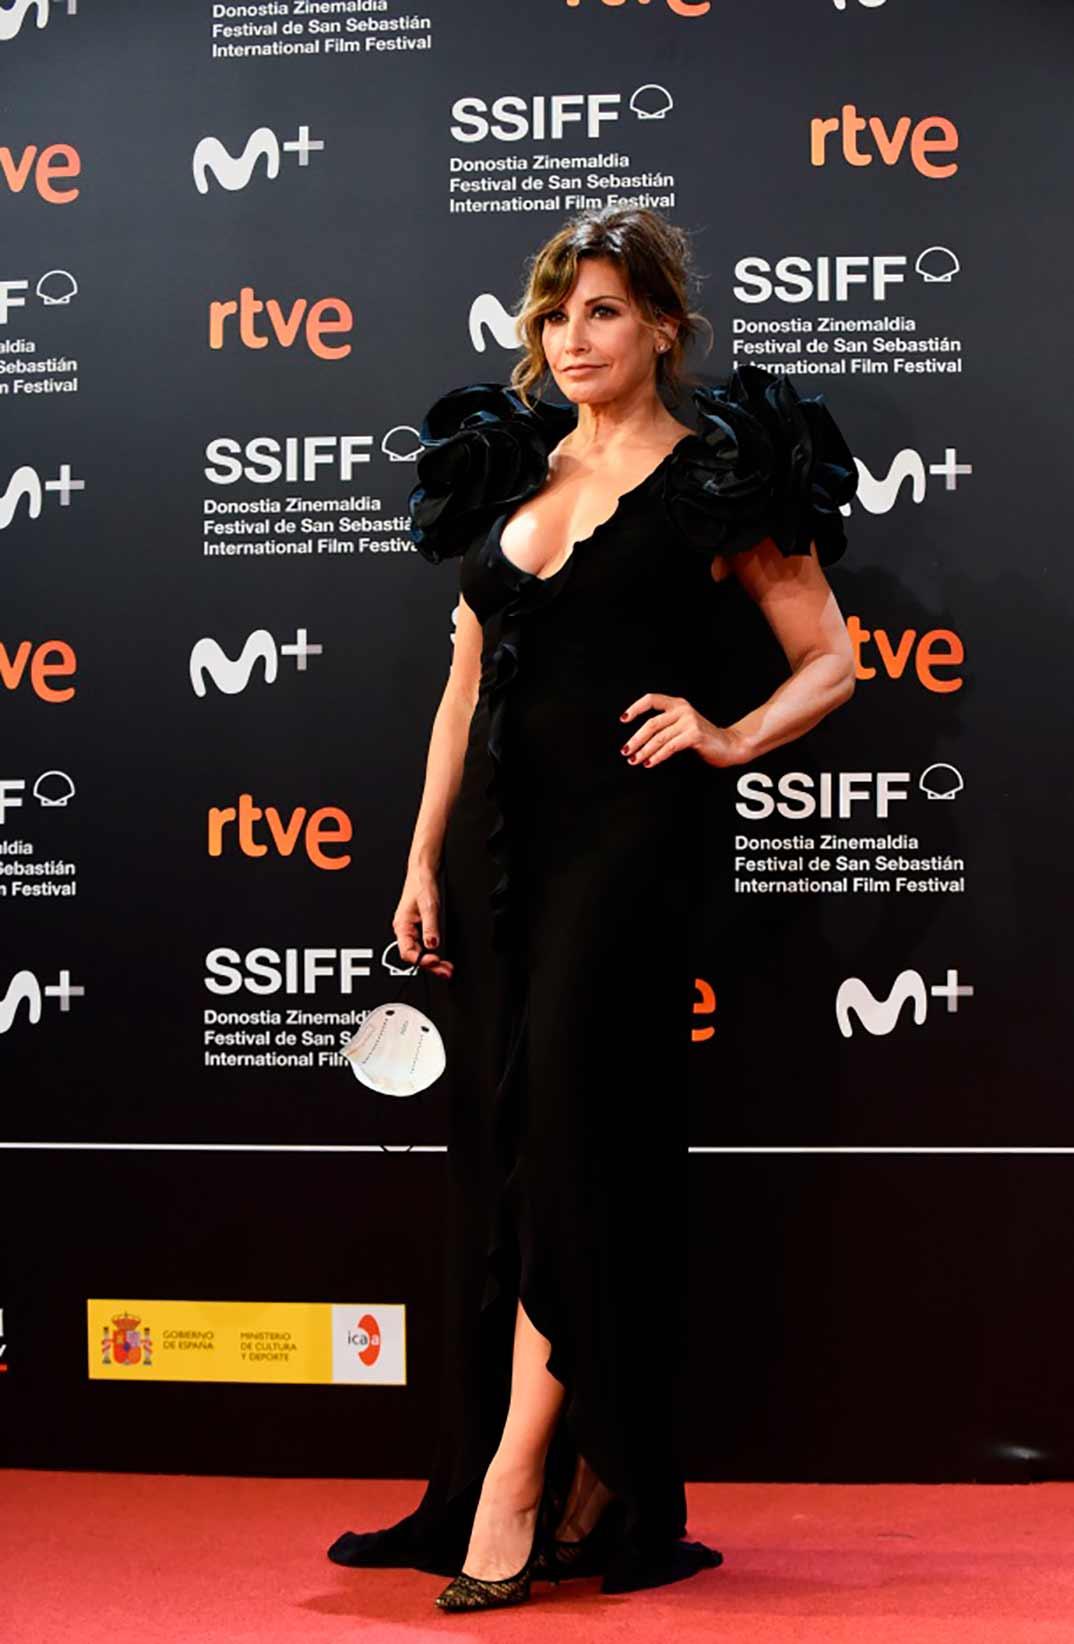 Gina Gershon © Festival de cine de San Sebastián